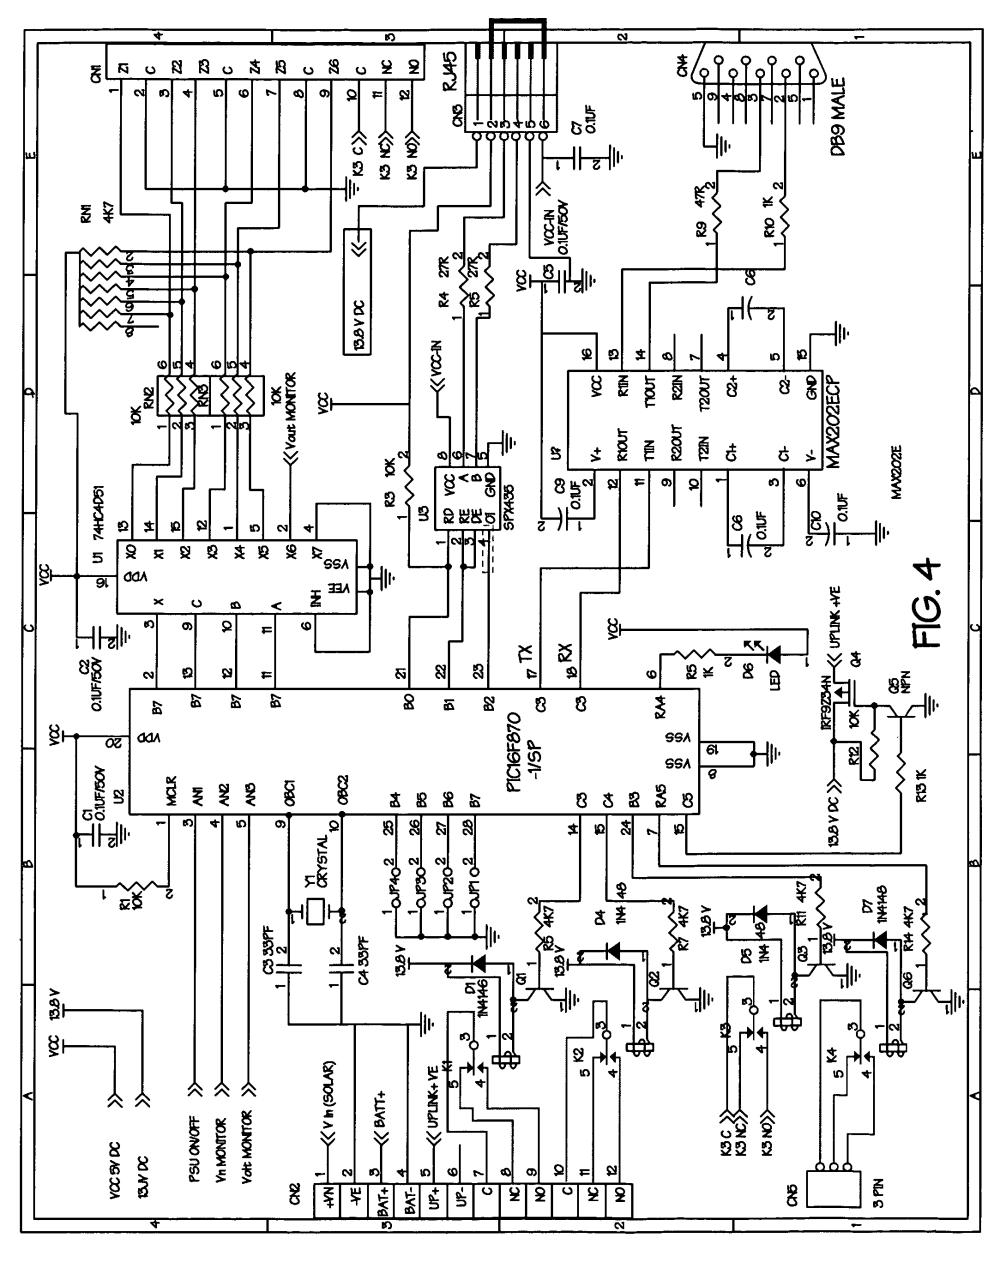 medium resolution of wiring rj45 to db9 free download wiring diagrams pictures wiring